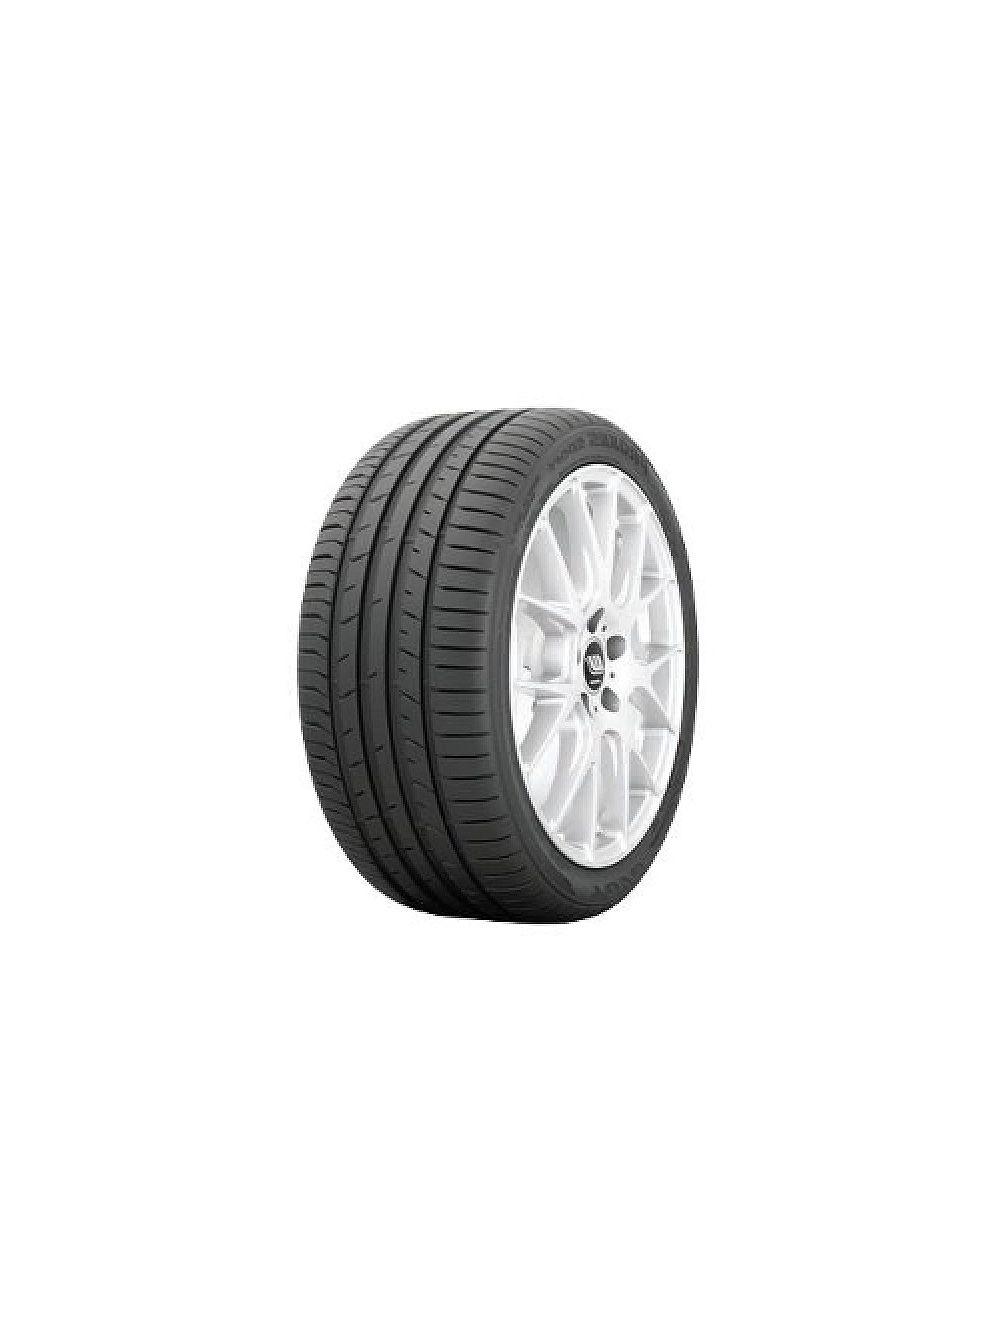 Toyo 265/30R20 Y Proxes Sport XL Nyári gumi